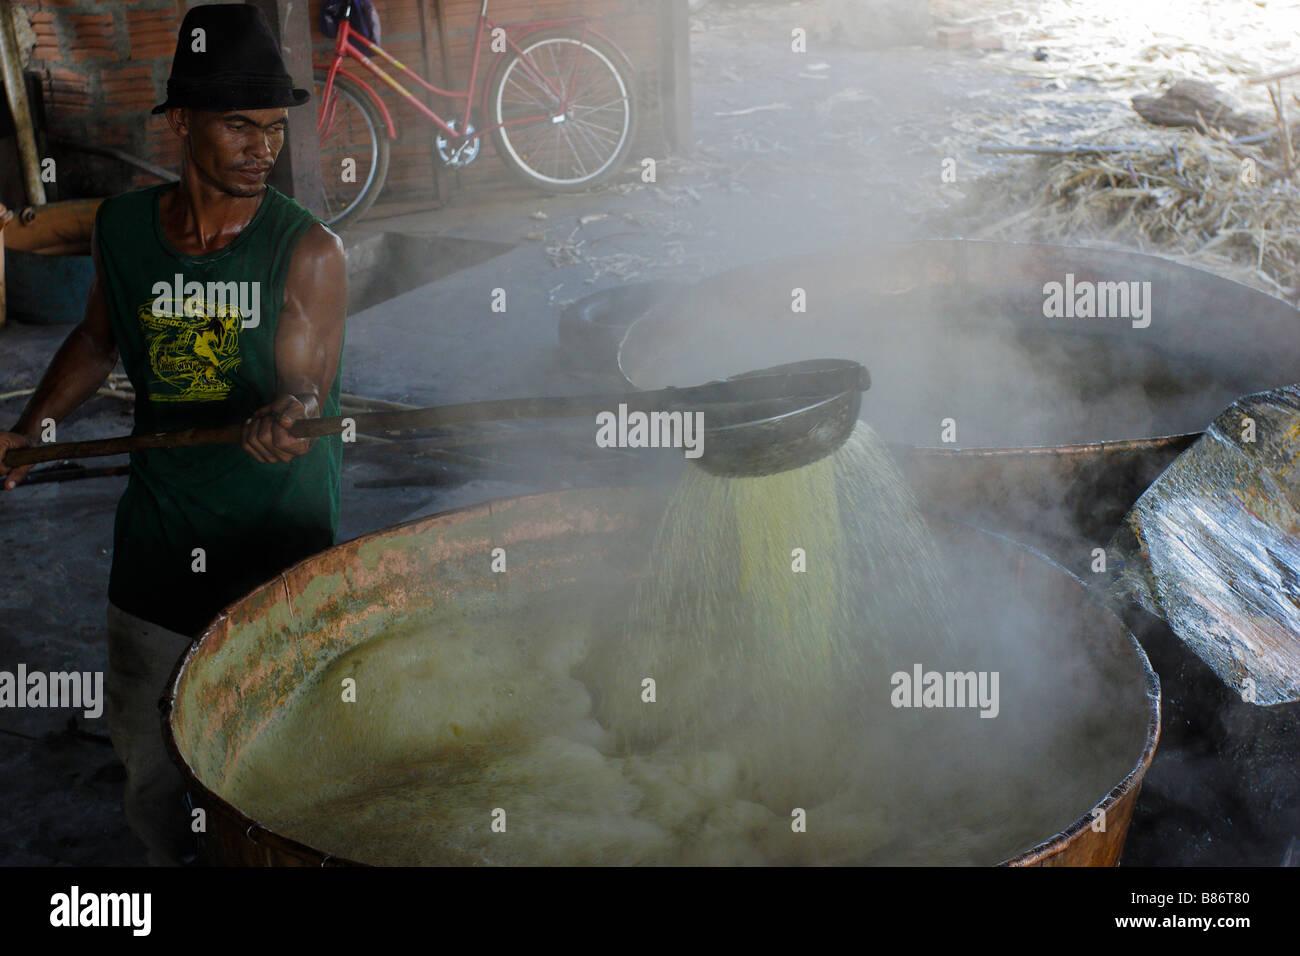 Alambique de cachaça alembic producción de rapadura disco cuadrado de azúcar marrón Januária Minas Gerais Brasil Foto de stock